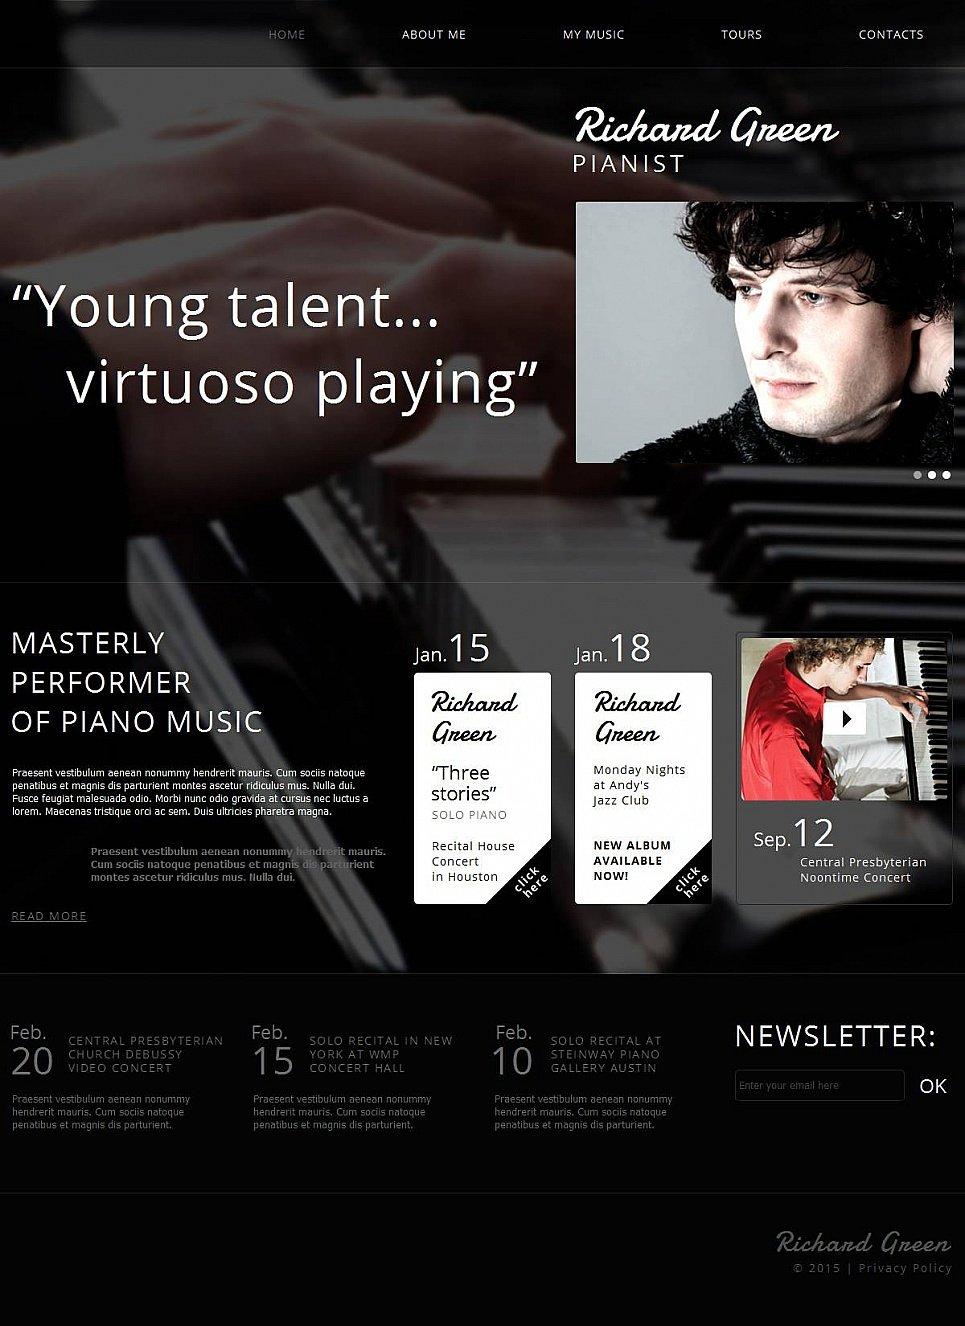 Musician Website Builder Template - image